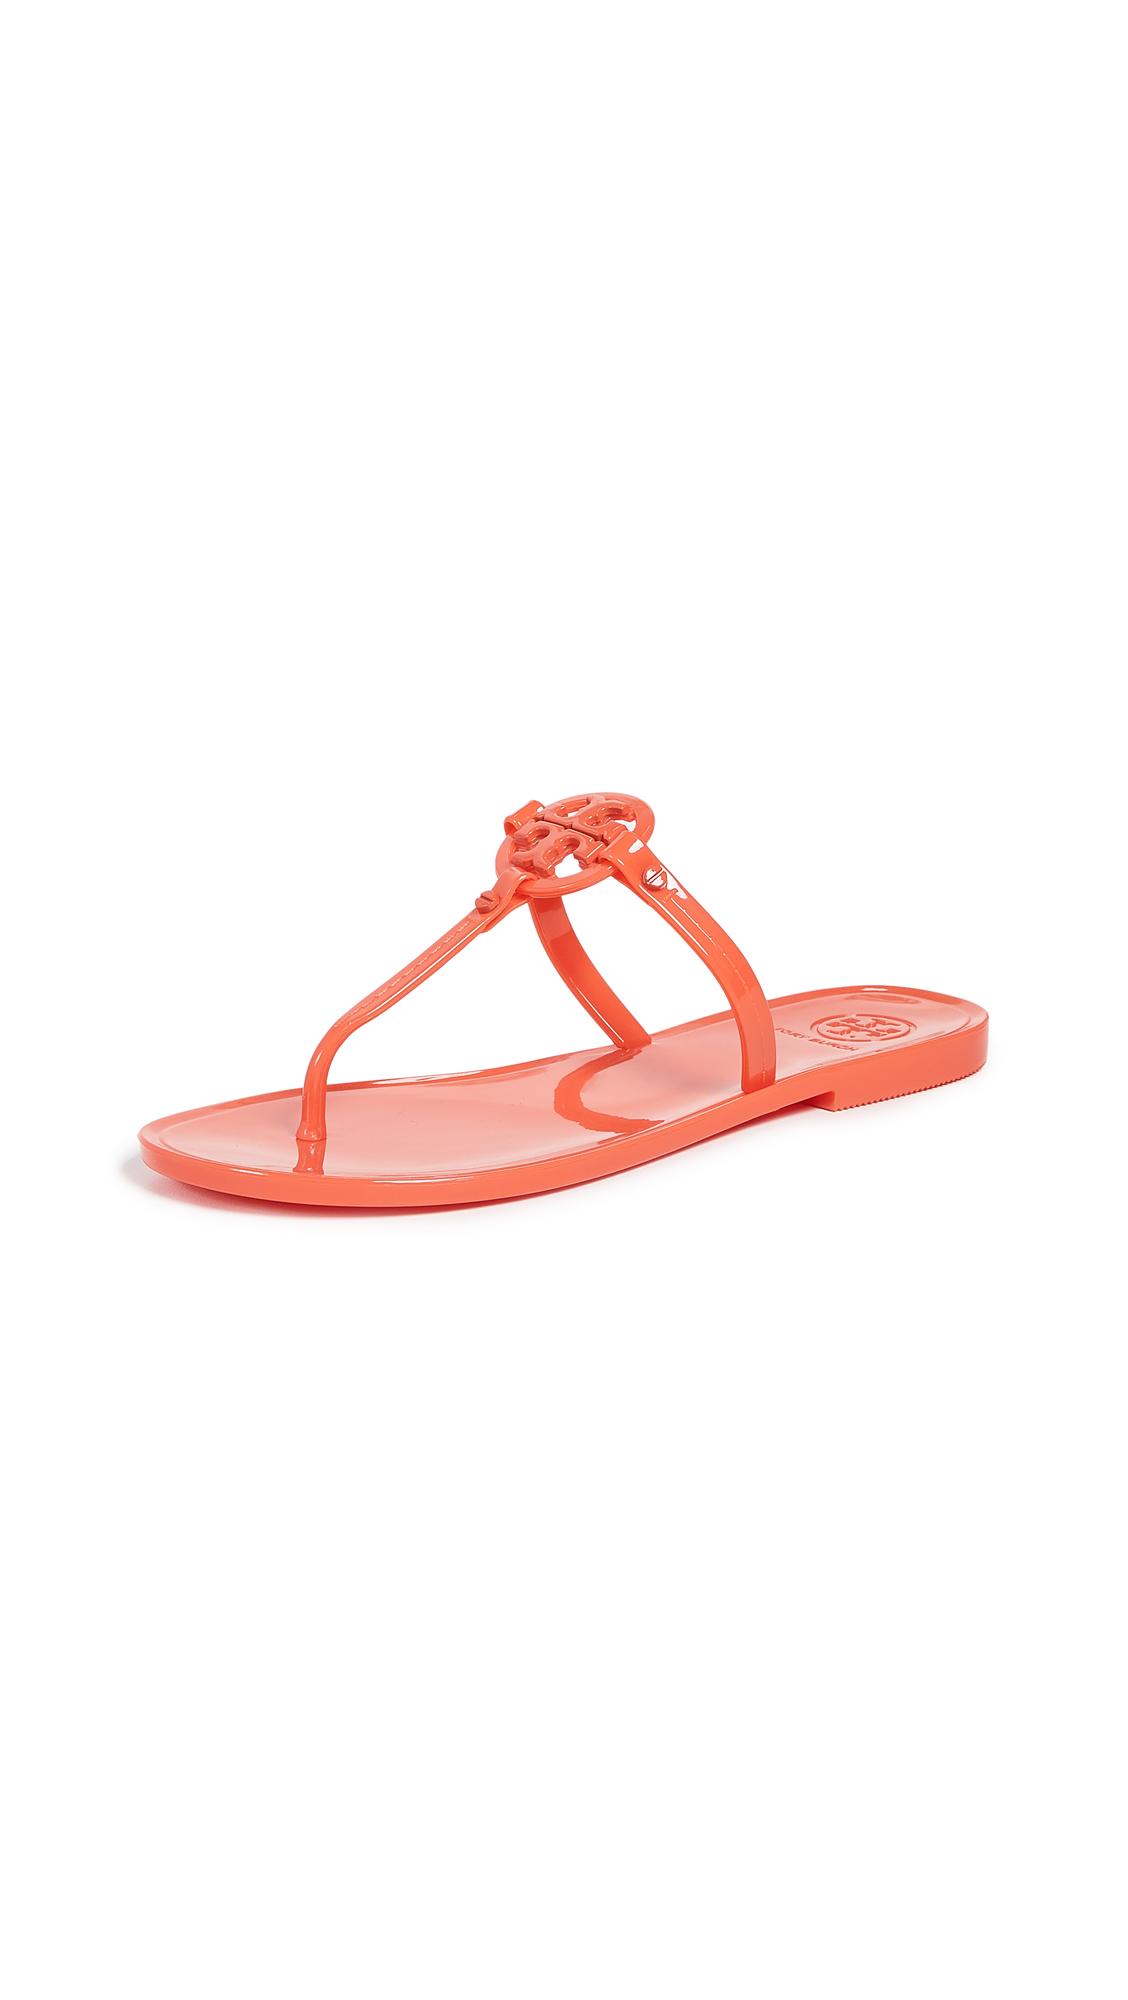 4cf3cbb04 Tory Burch Mini Miller Flat Thong Sandals In Poppy Coral